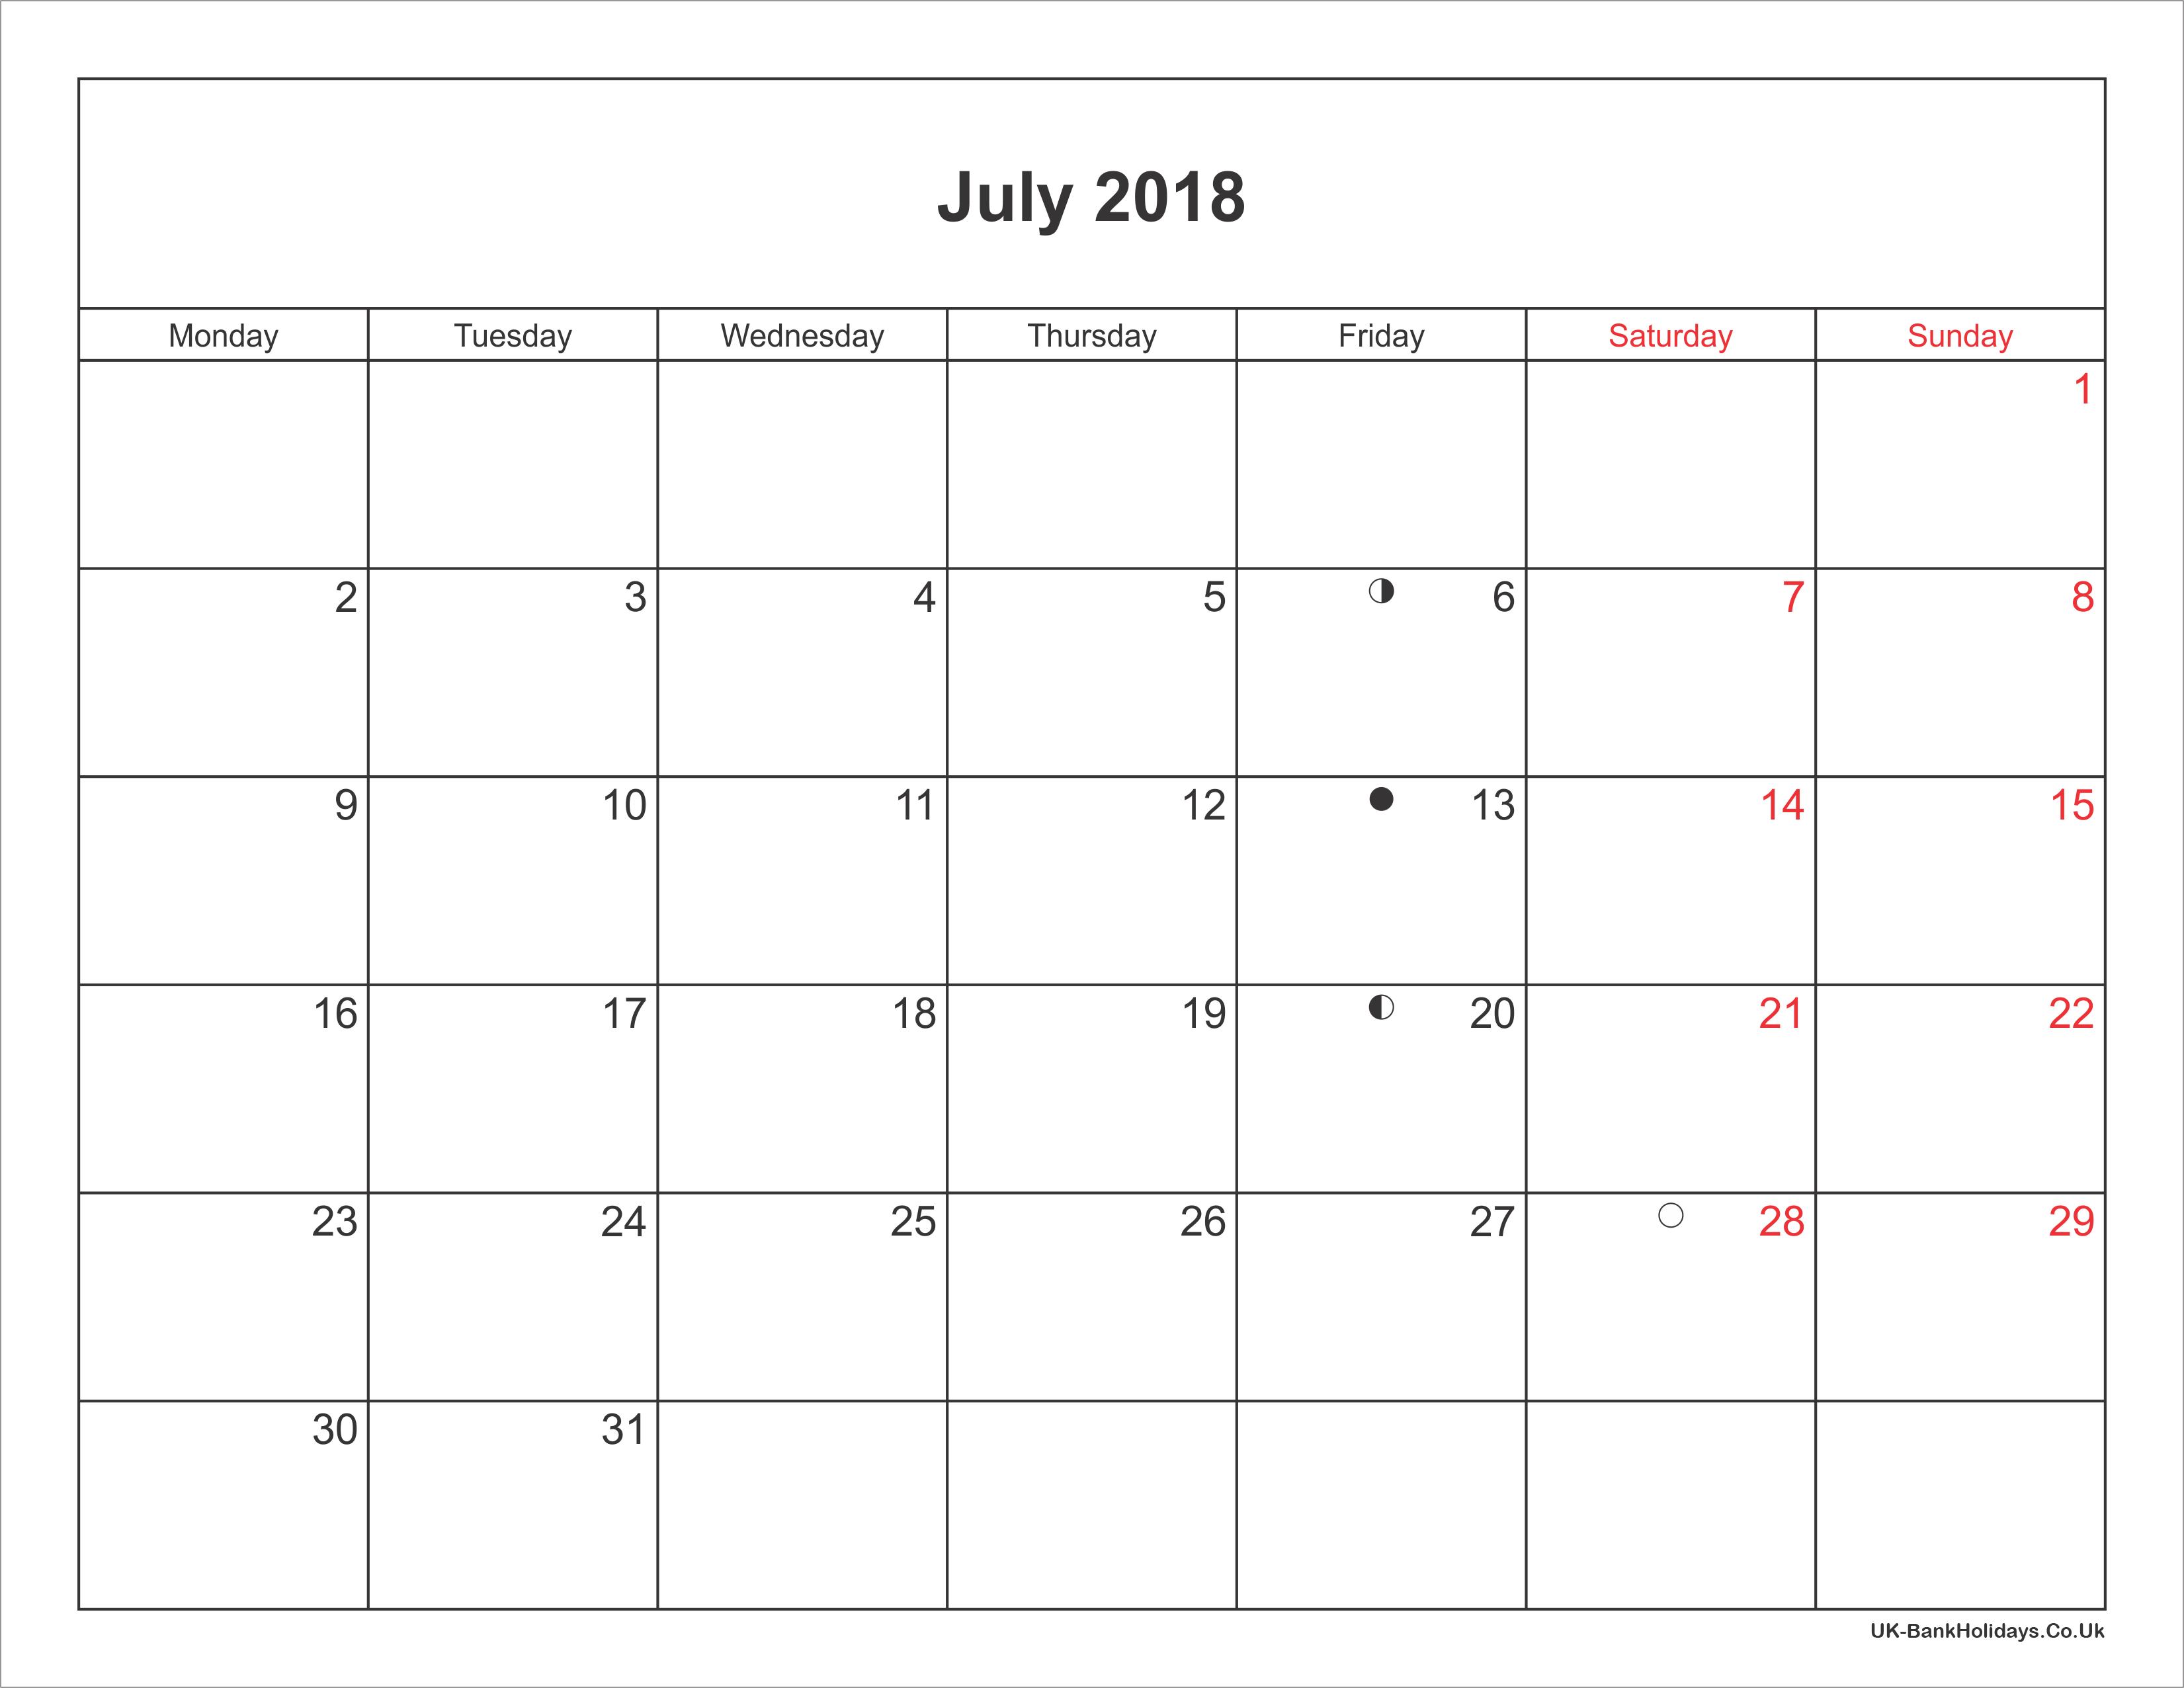 July 2018 Calendar Printable with Bank Holidays UK